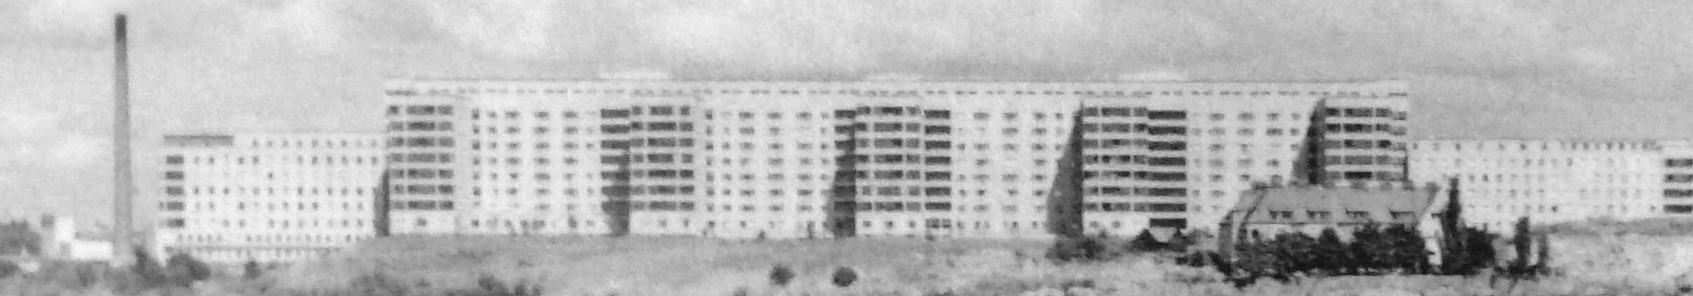 Södersjukhuset_1951